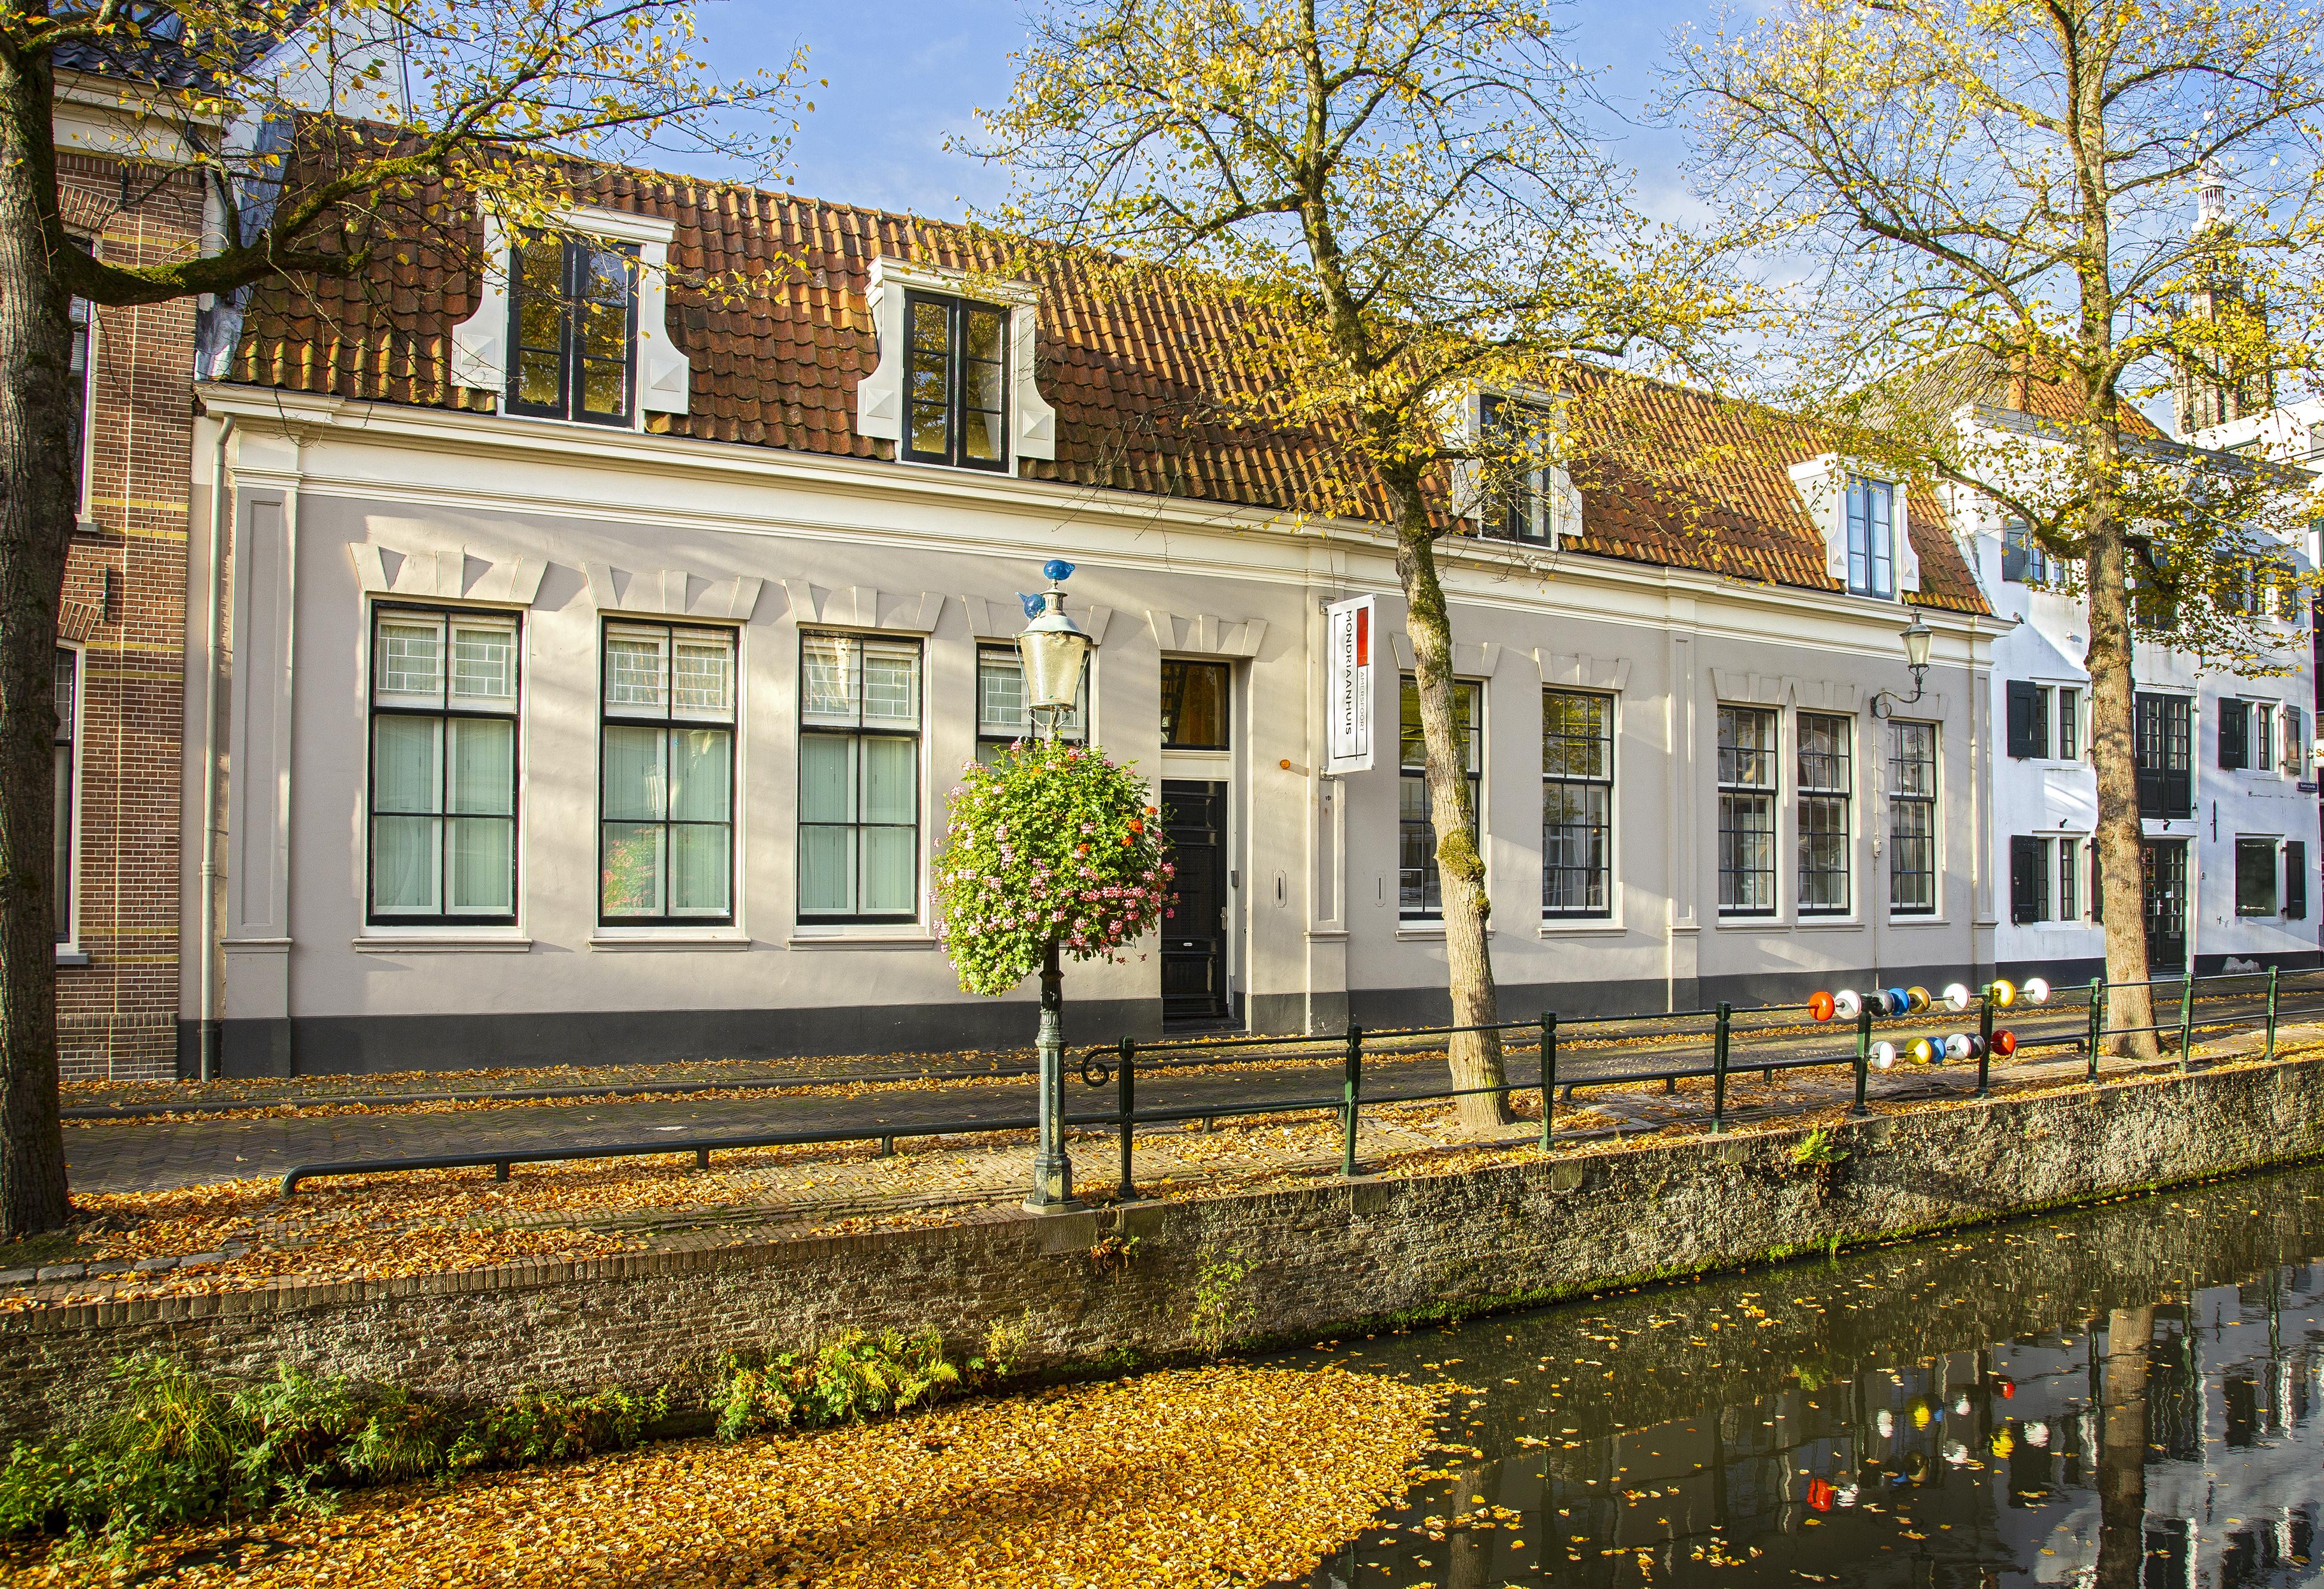 Mondriaanhuis_neu